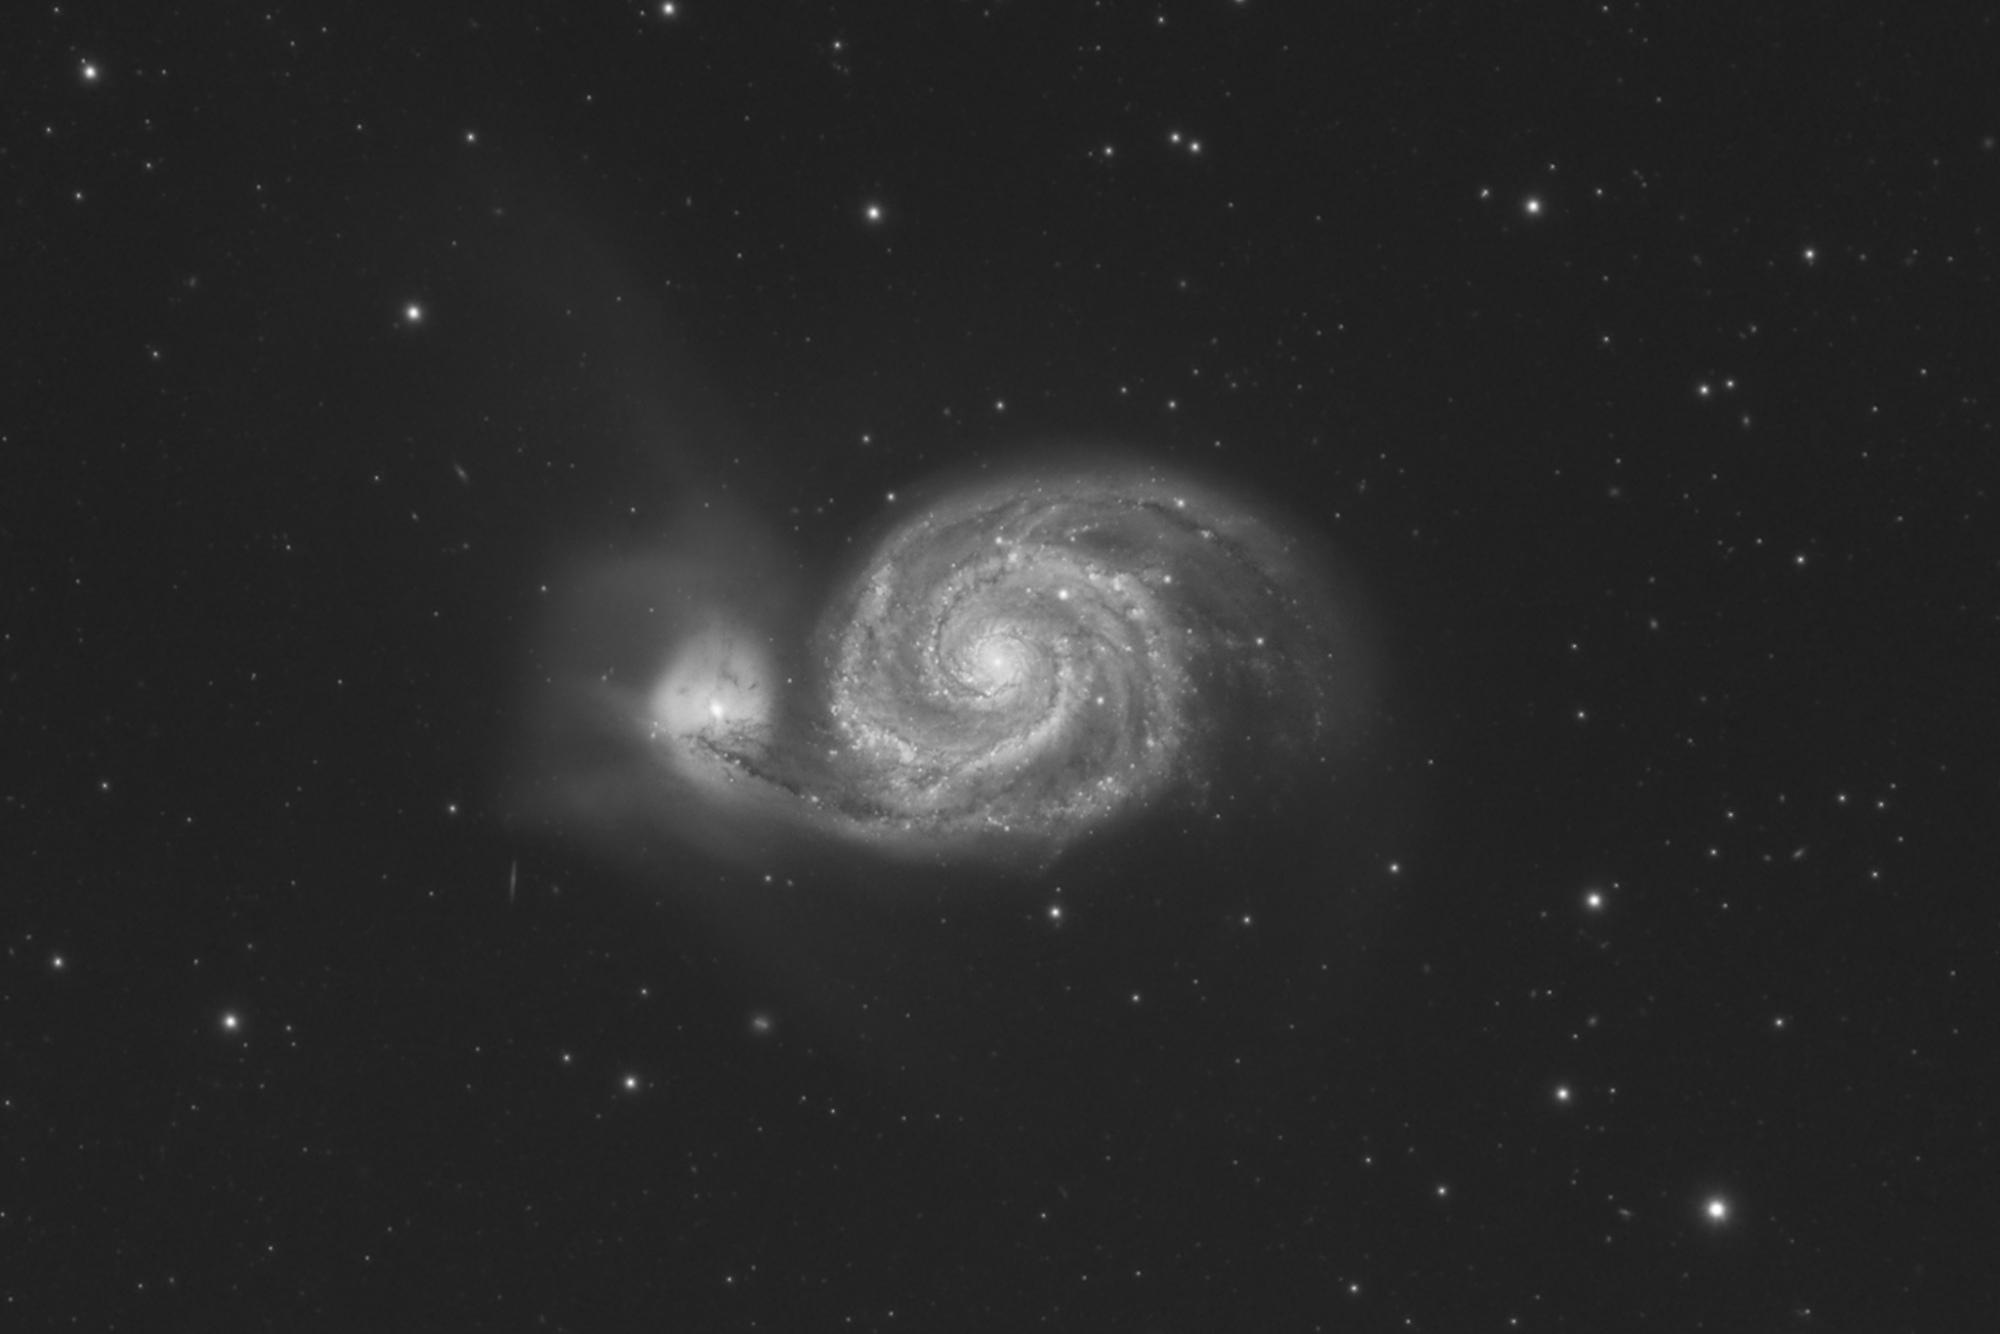 M51_L v1-2048-2.jpg